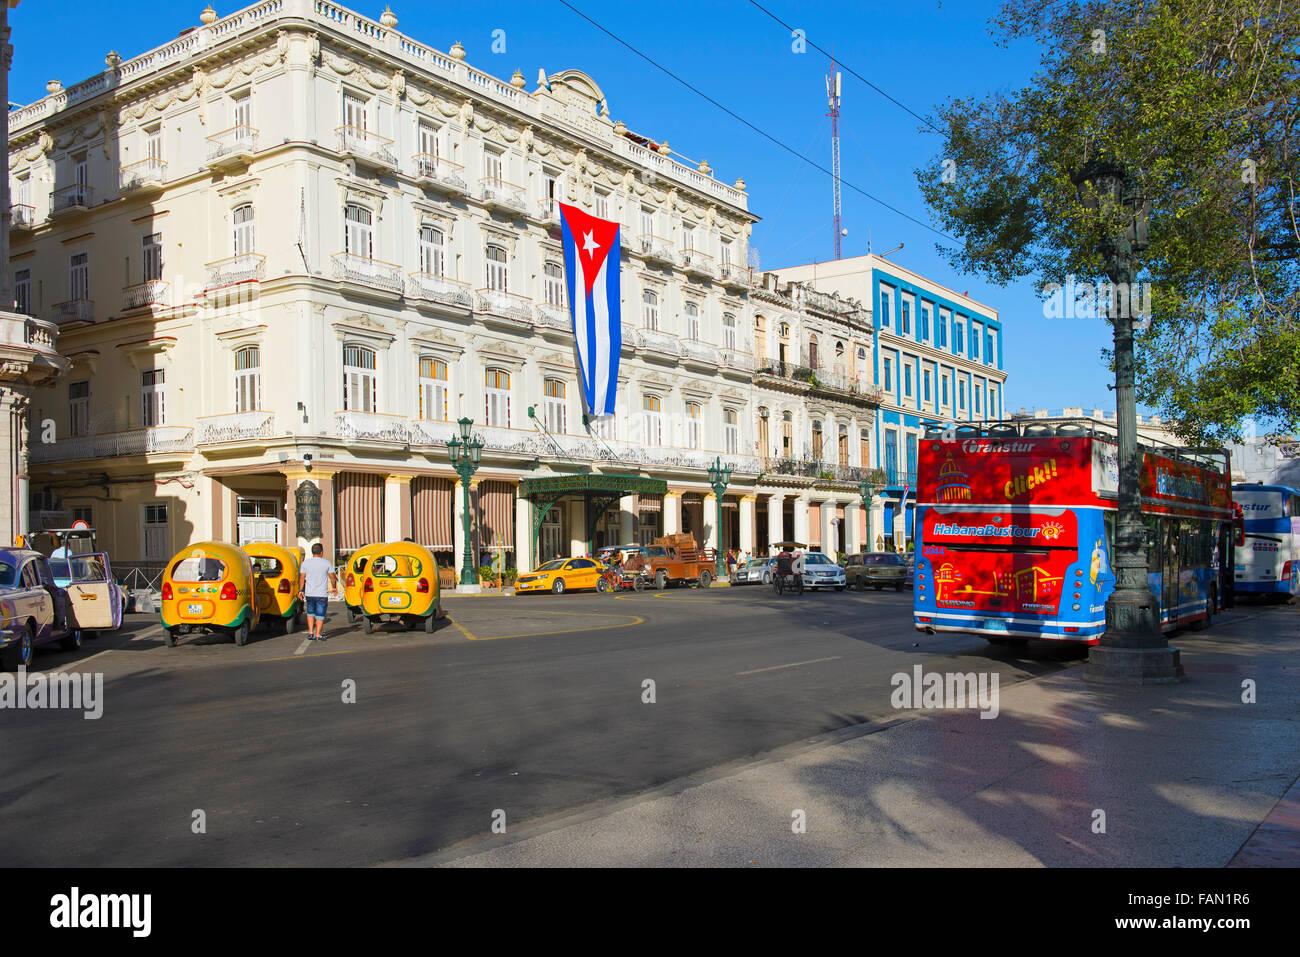 Inglaterra Hotel and Telegrafo Hotel, Havana, La Habana, Cuba - Stock Image